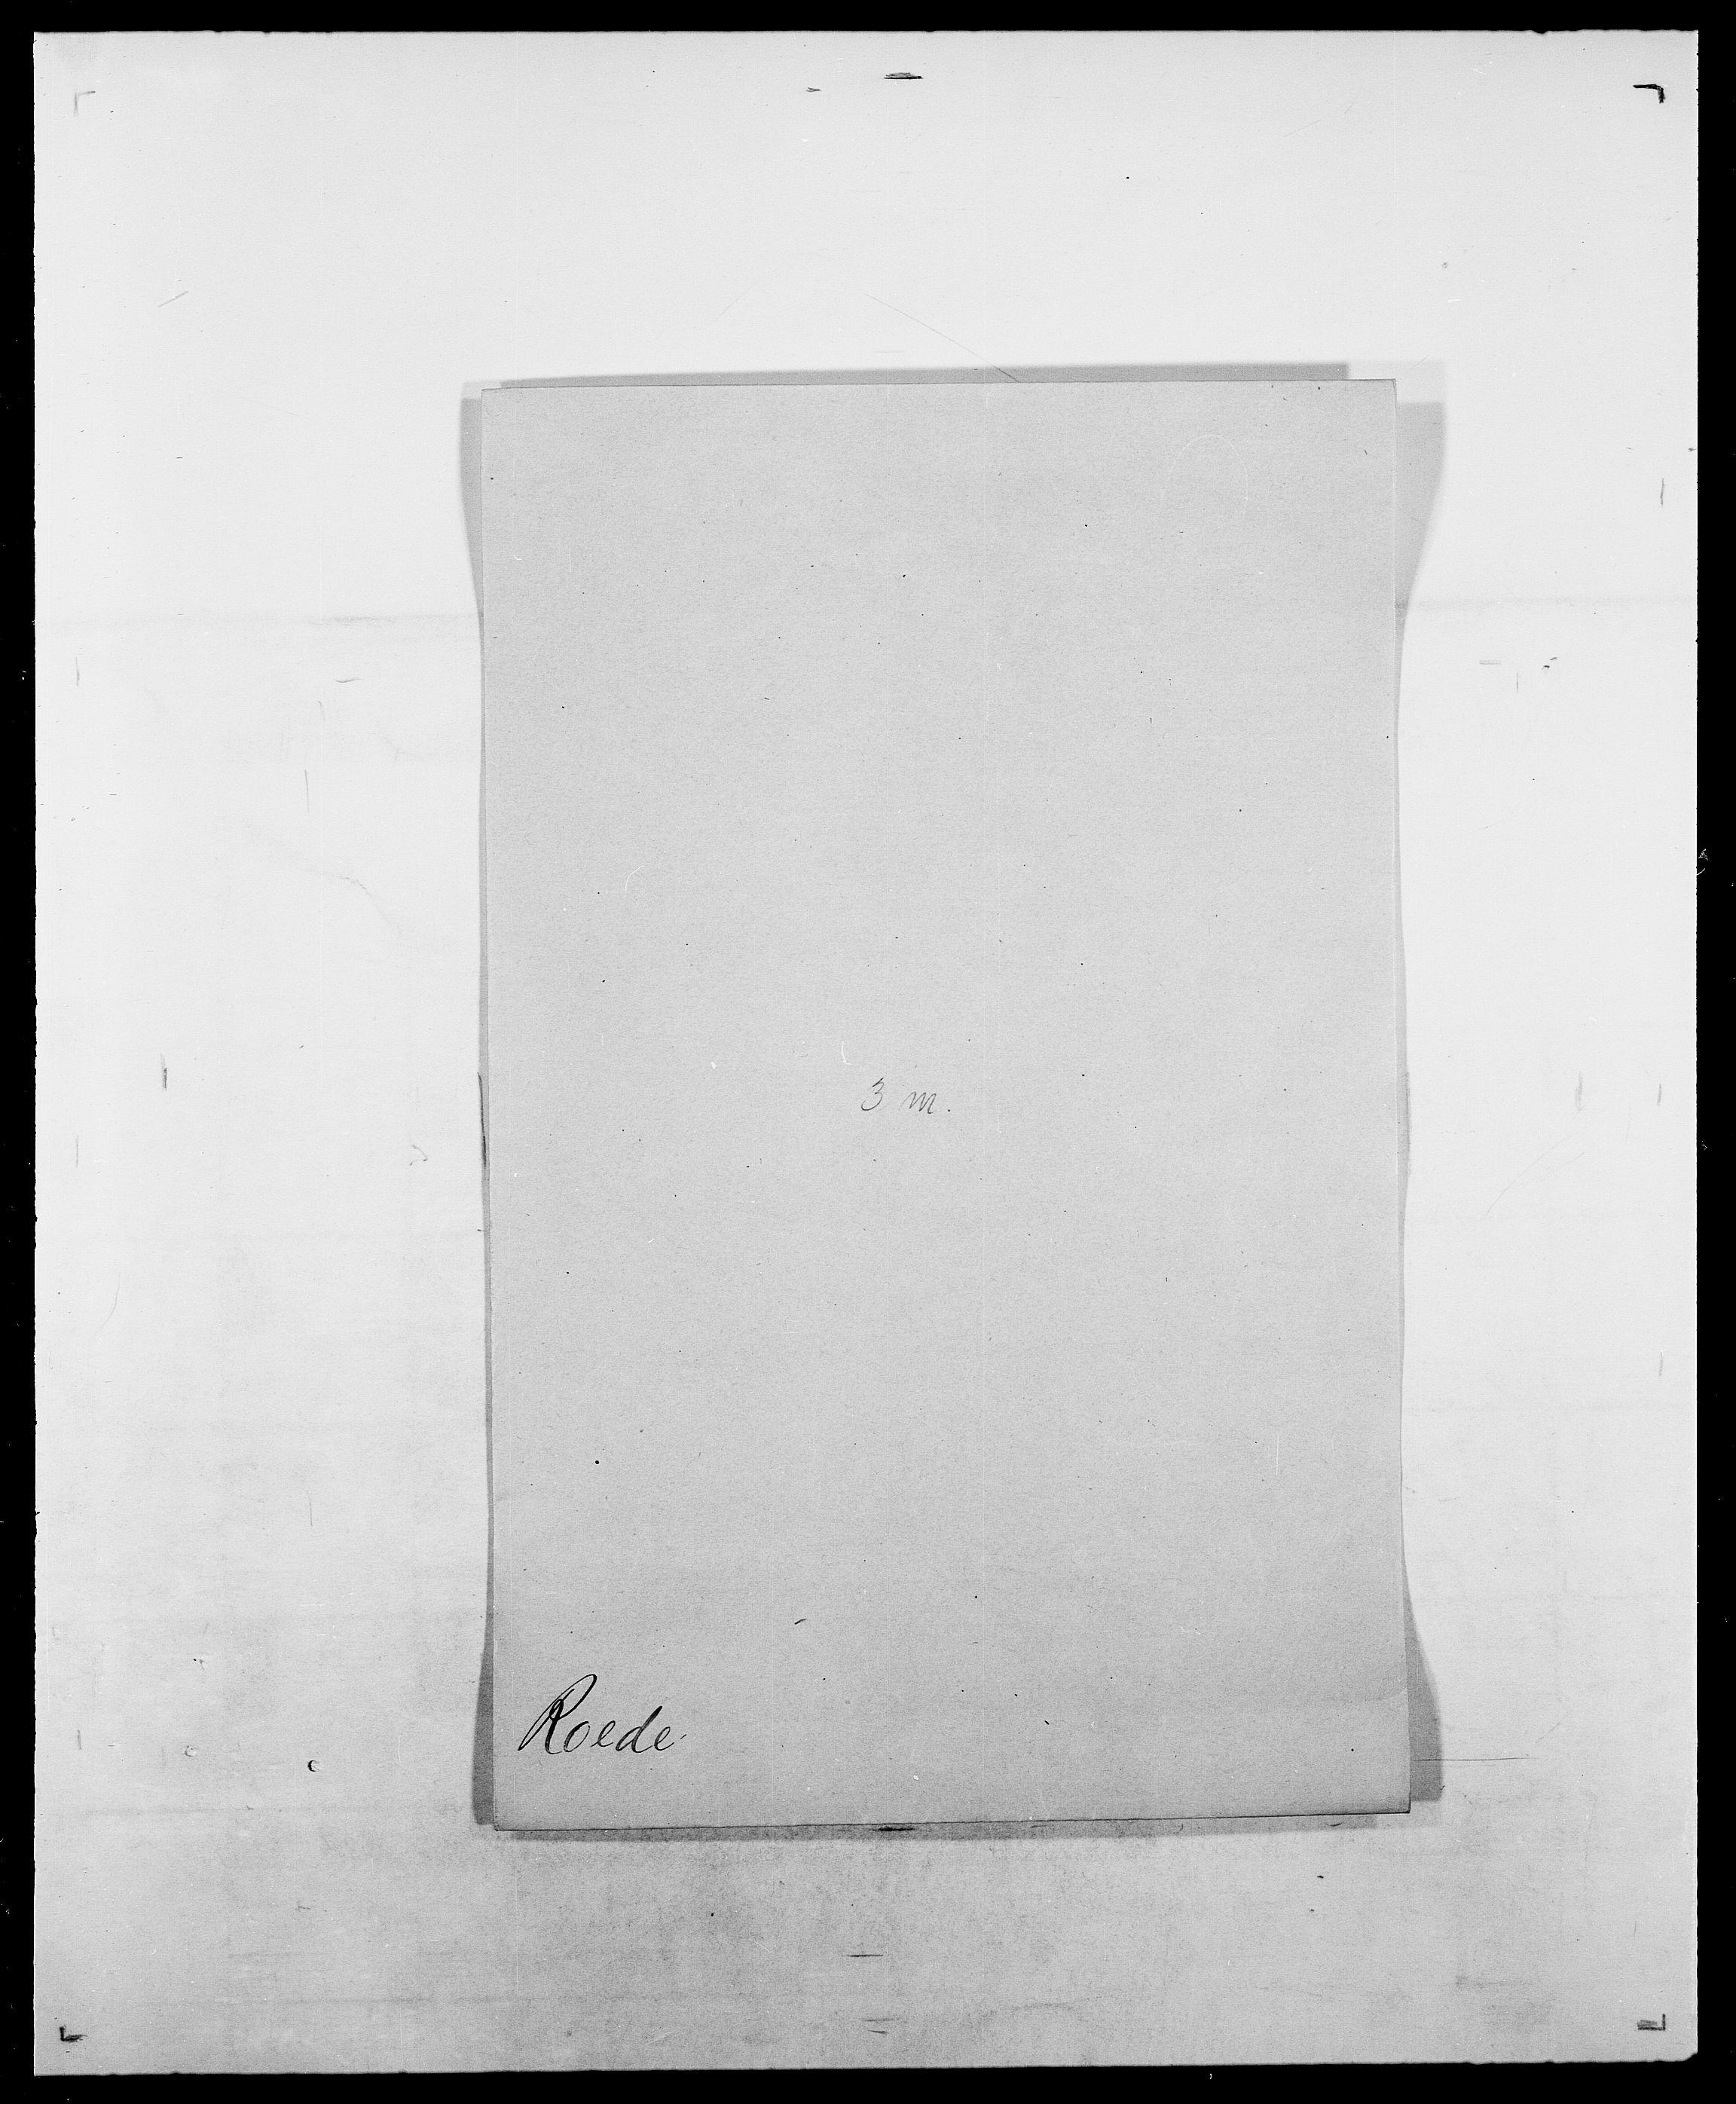 SAO, Delgobe, Charles Antoine - samling, D/Da/L0033: Roald - Røyem, s. 61